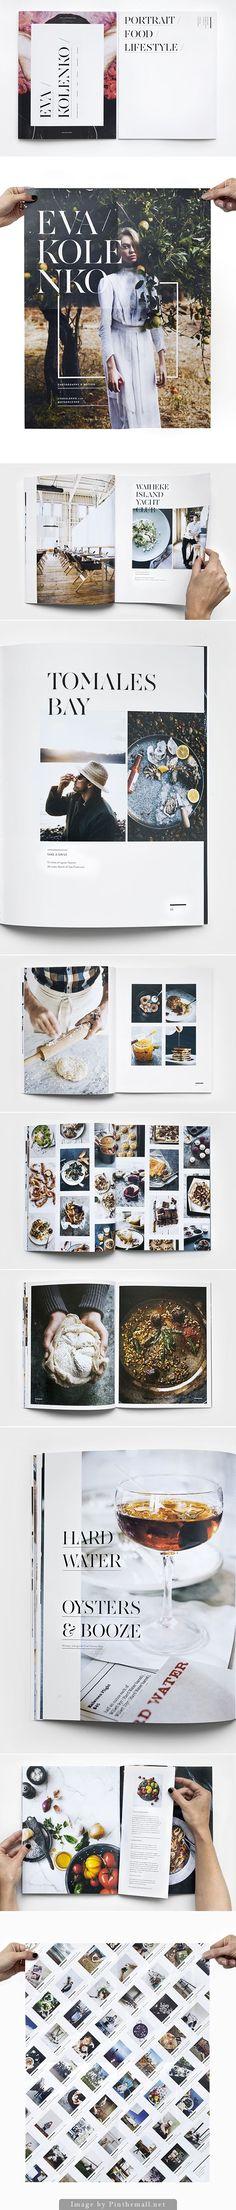 Magazine design and layout ideas Layout Design, Graphisches Design, The Design Files, Graphic Design Layouts, Print Layout, Graphic Design Typography, Book Design, Cover Design, Print Design